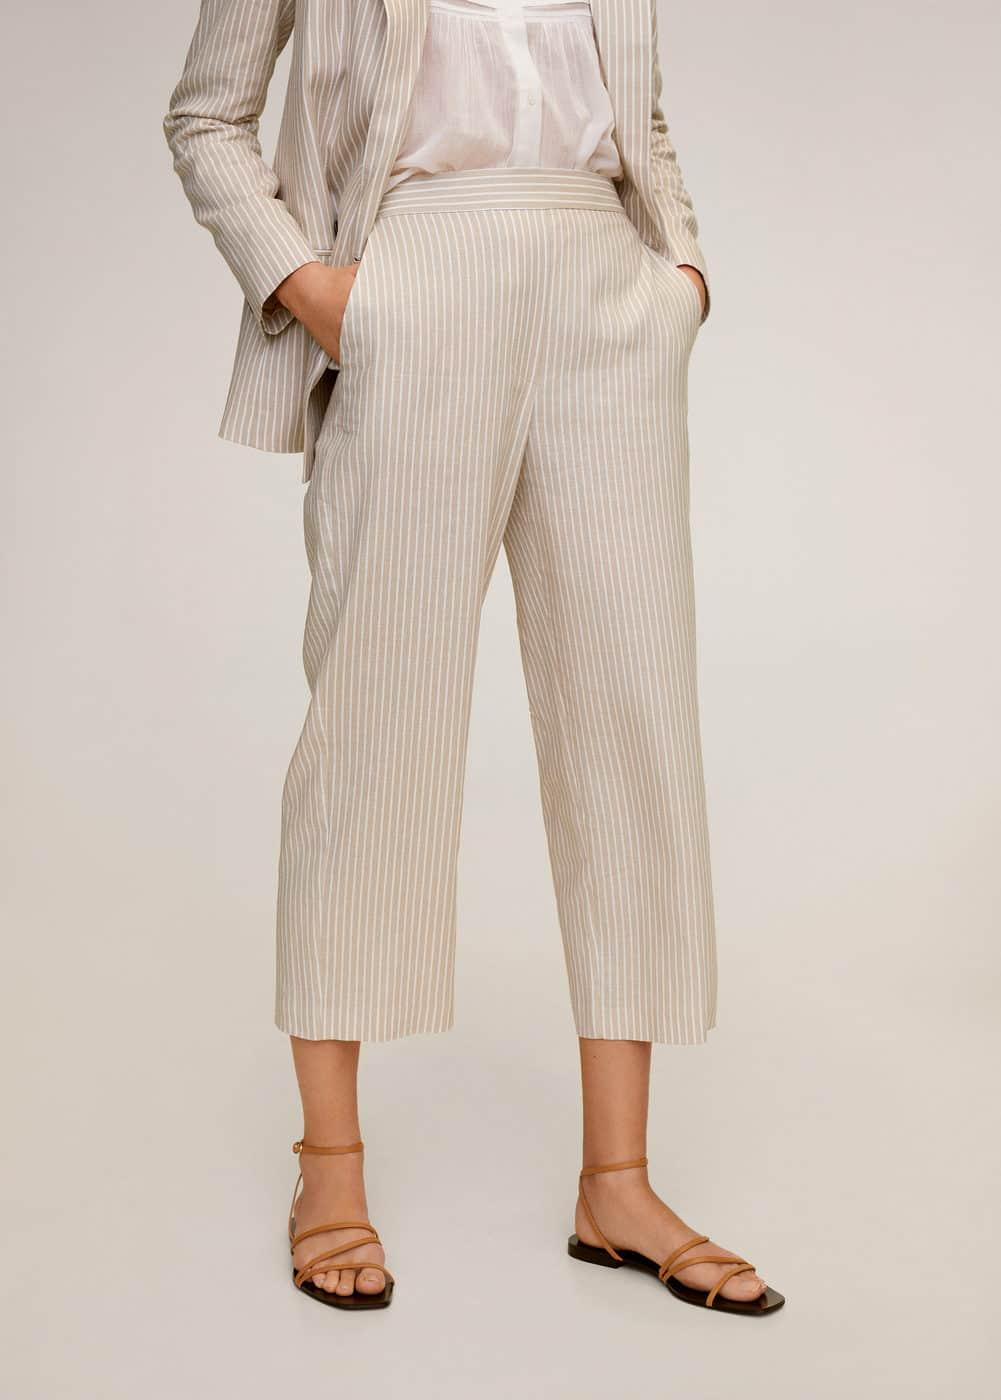 m-wave:pantalon lino rayas